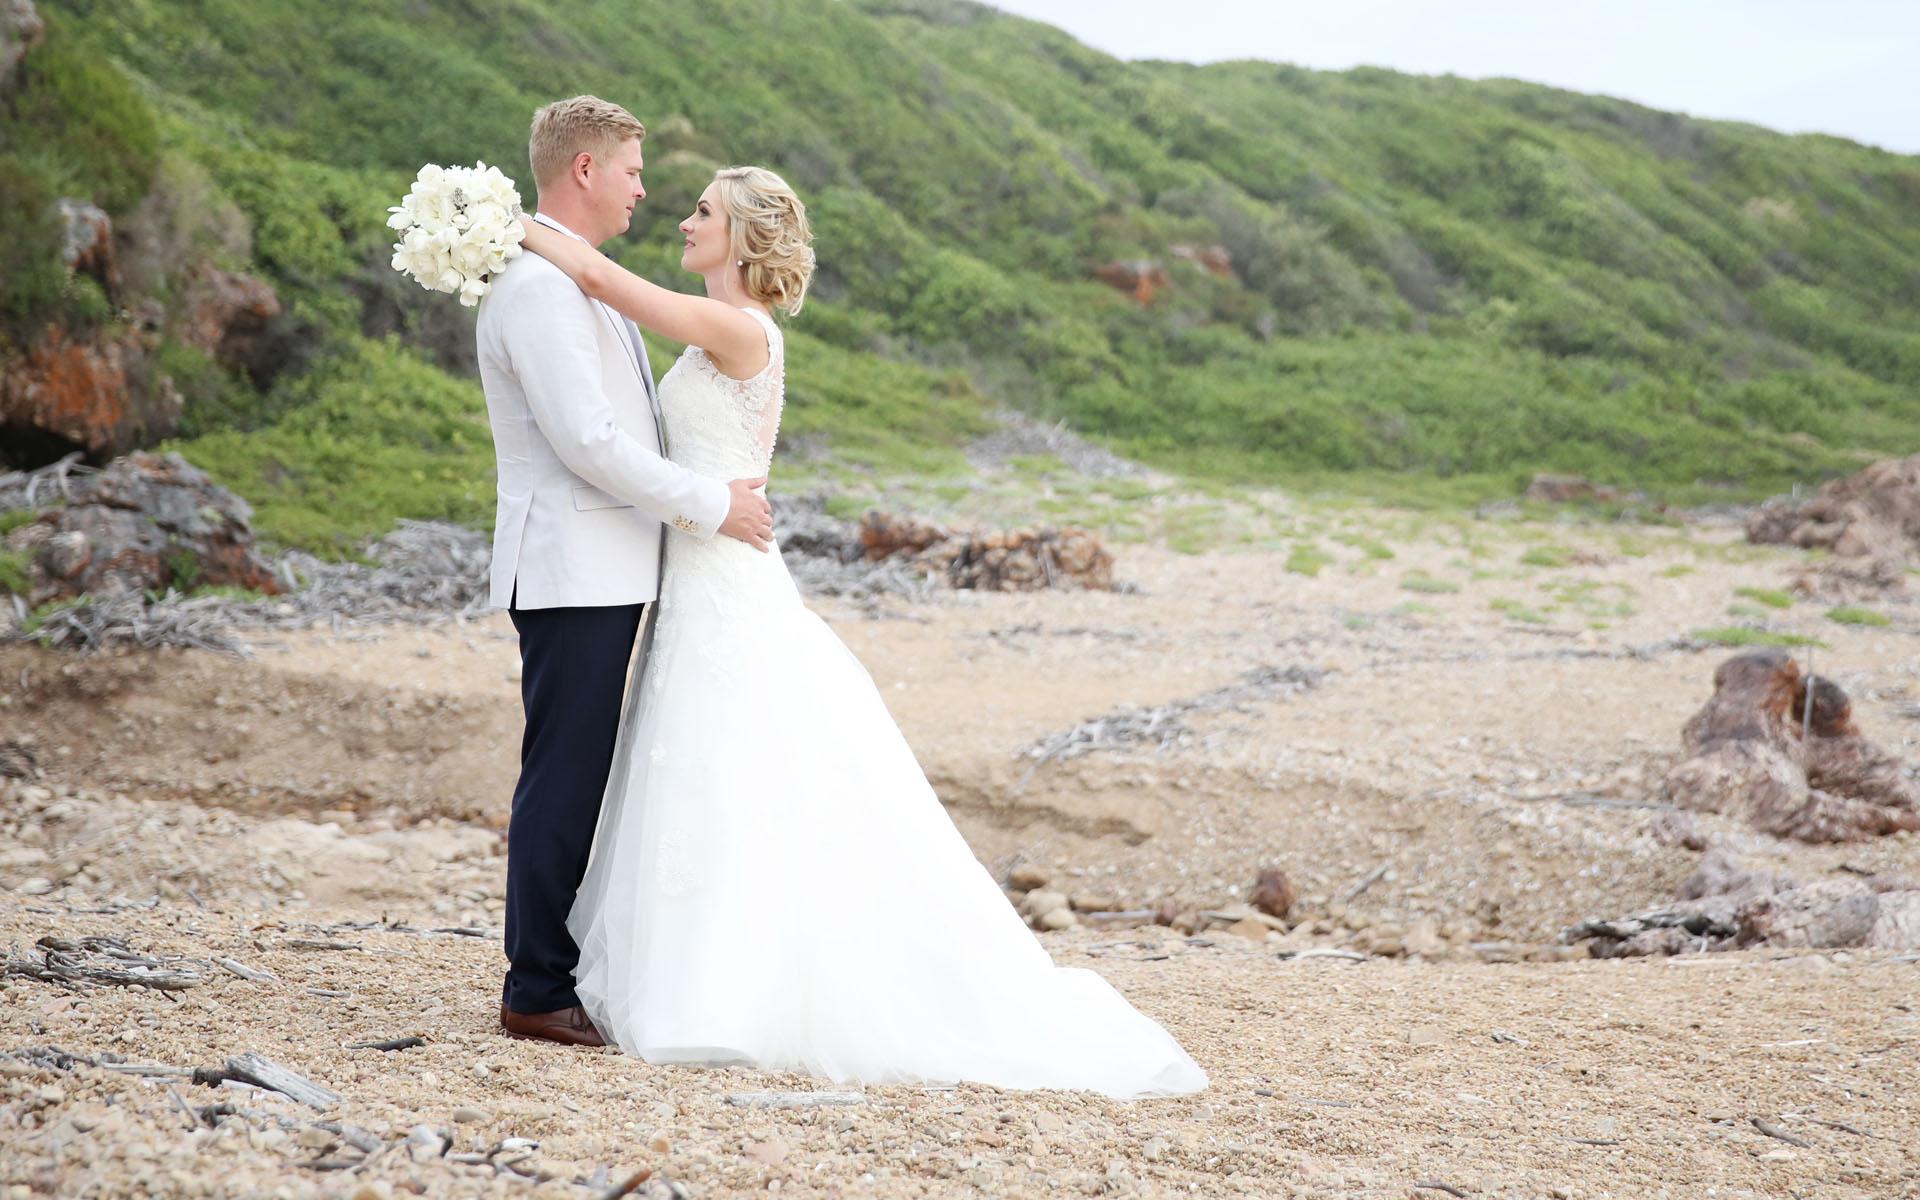 Wedding portfolio showroom - weddings by marius